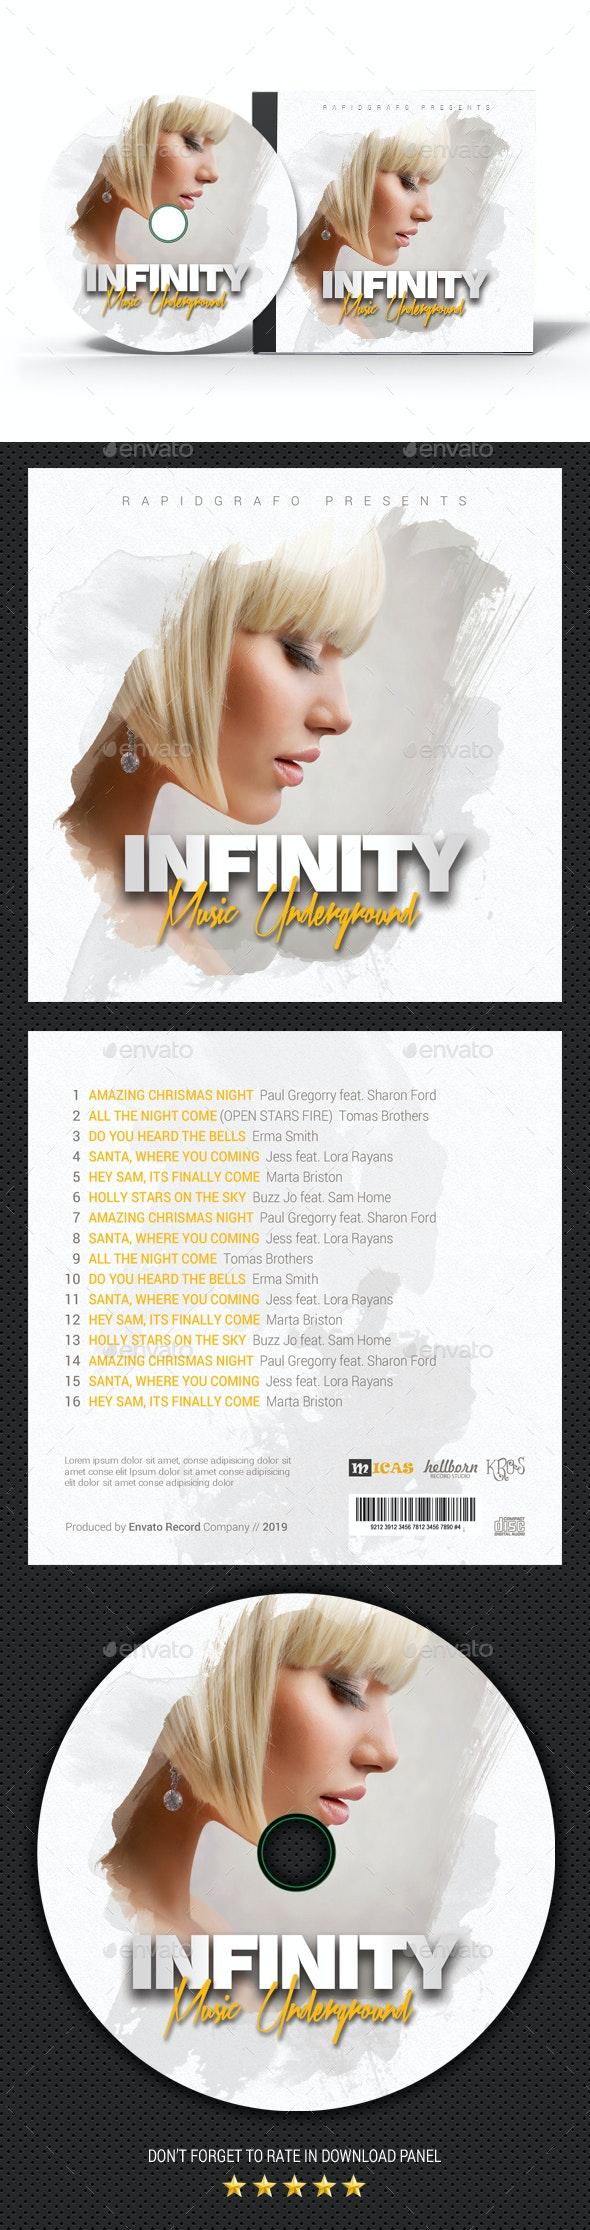 Infinity Music CD Cover - CD & DVD Artwork Print Templates